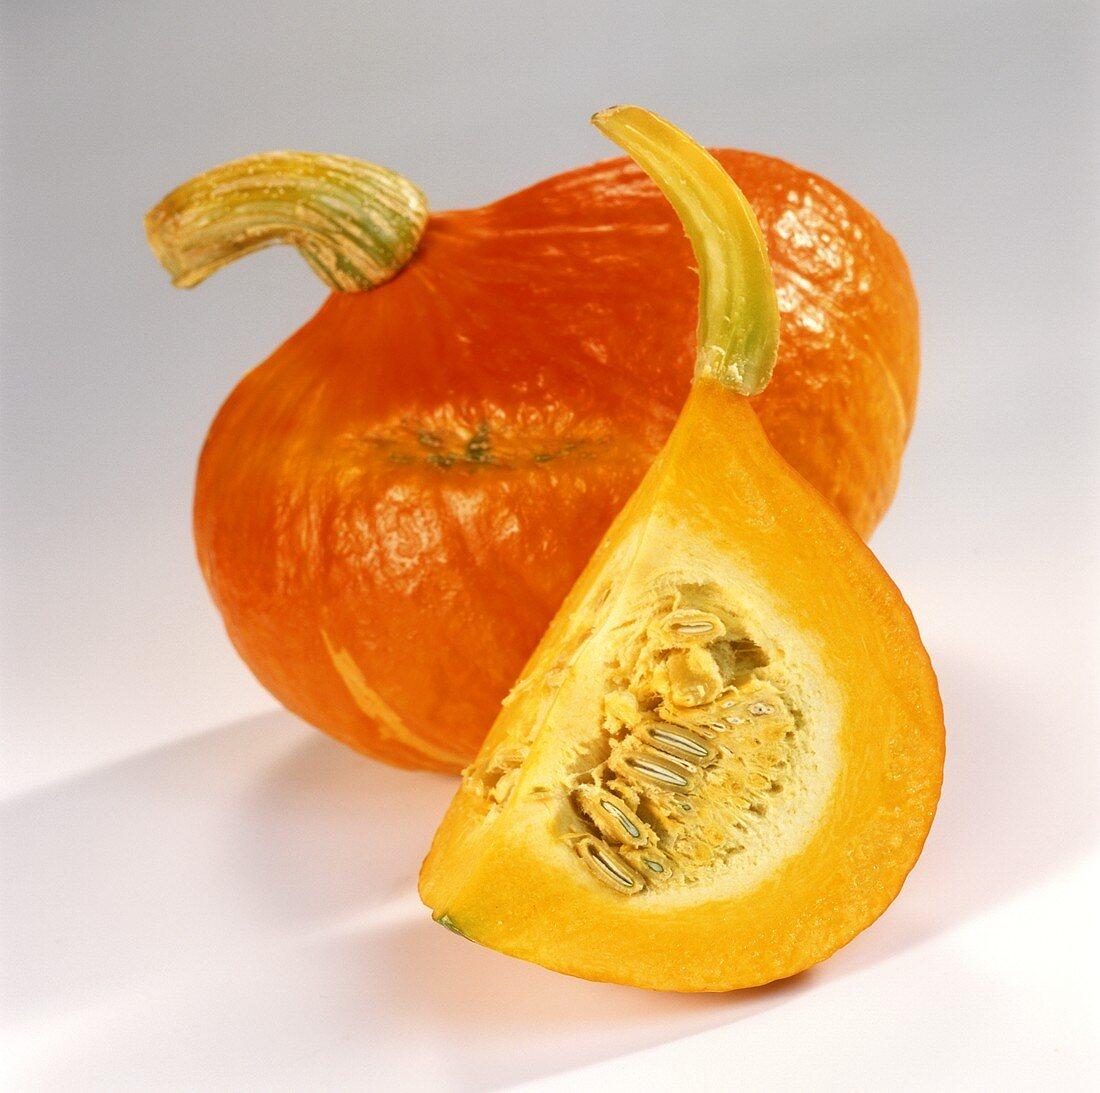 Whole pumpkin and wedge of pumpkin (Hokkaido)